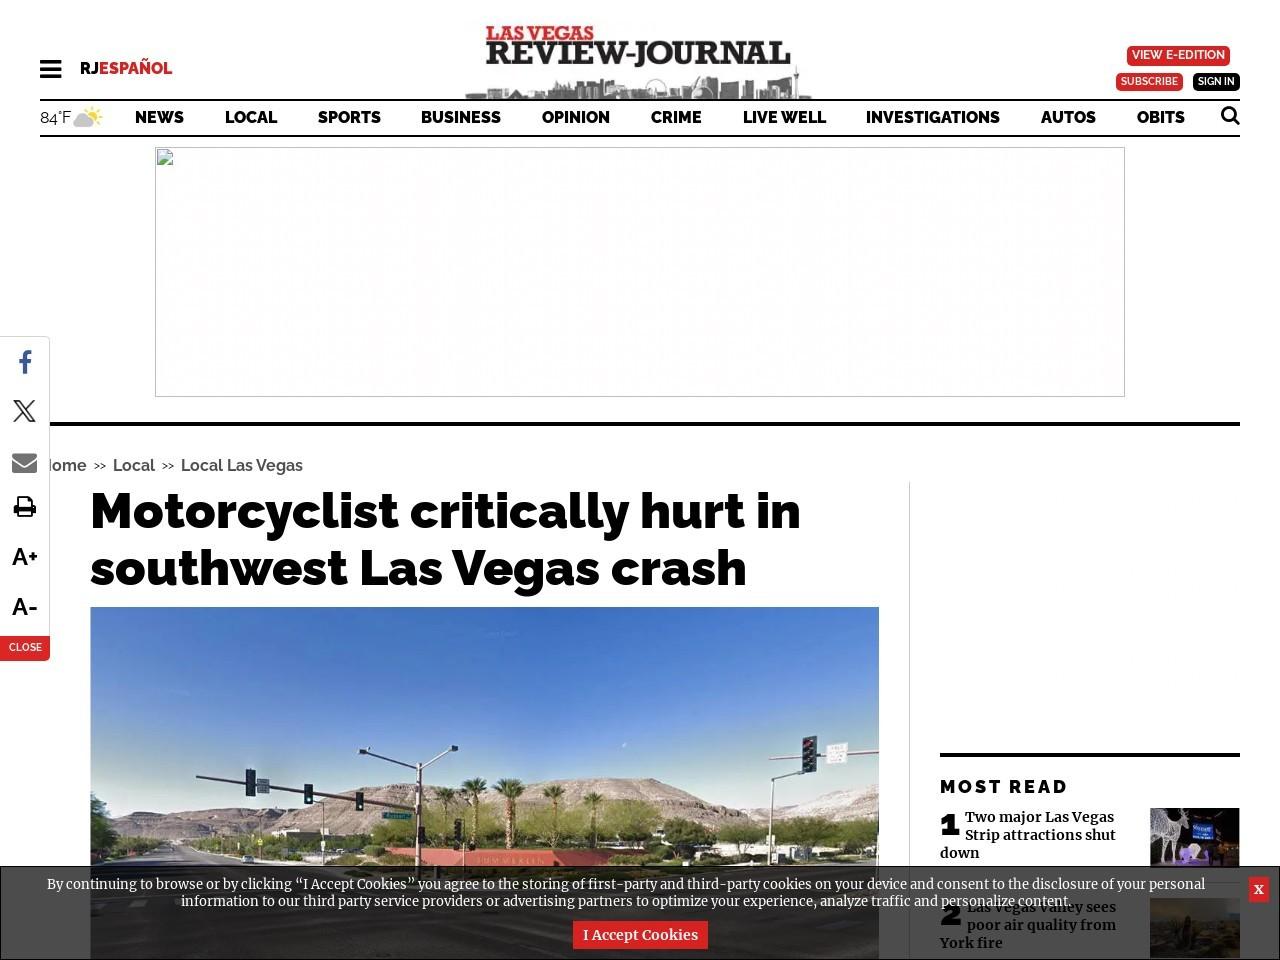 Motorcyclist critically hurt in southwest Las Vegas crash